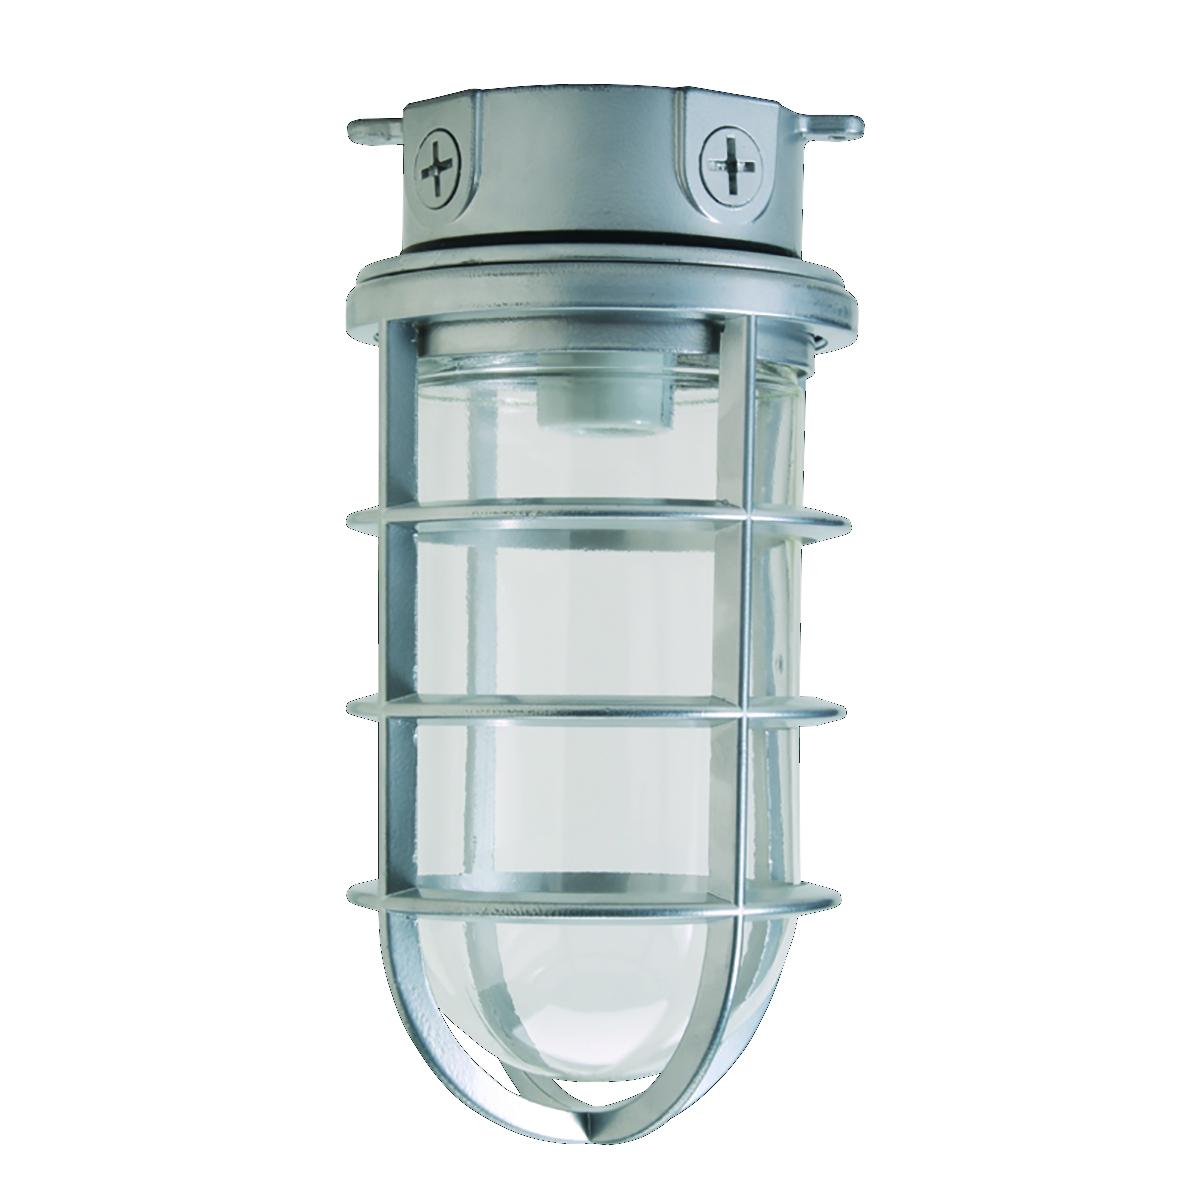 Hubbell® Industrial Lighting VX-1